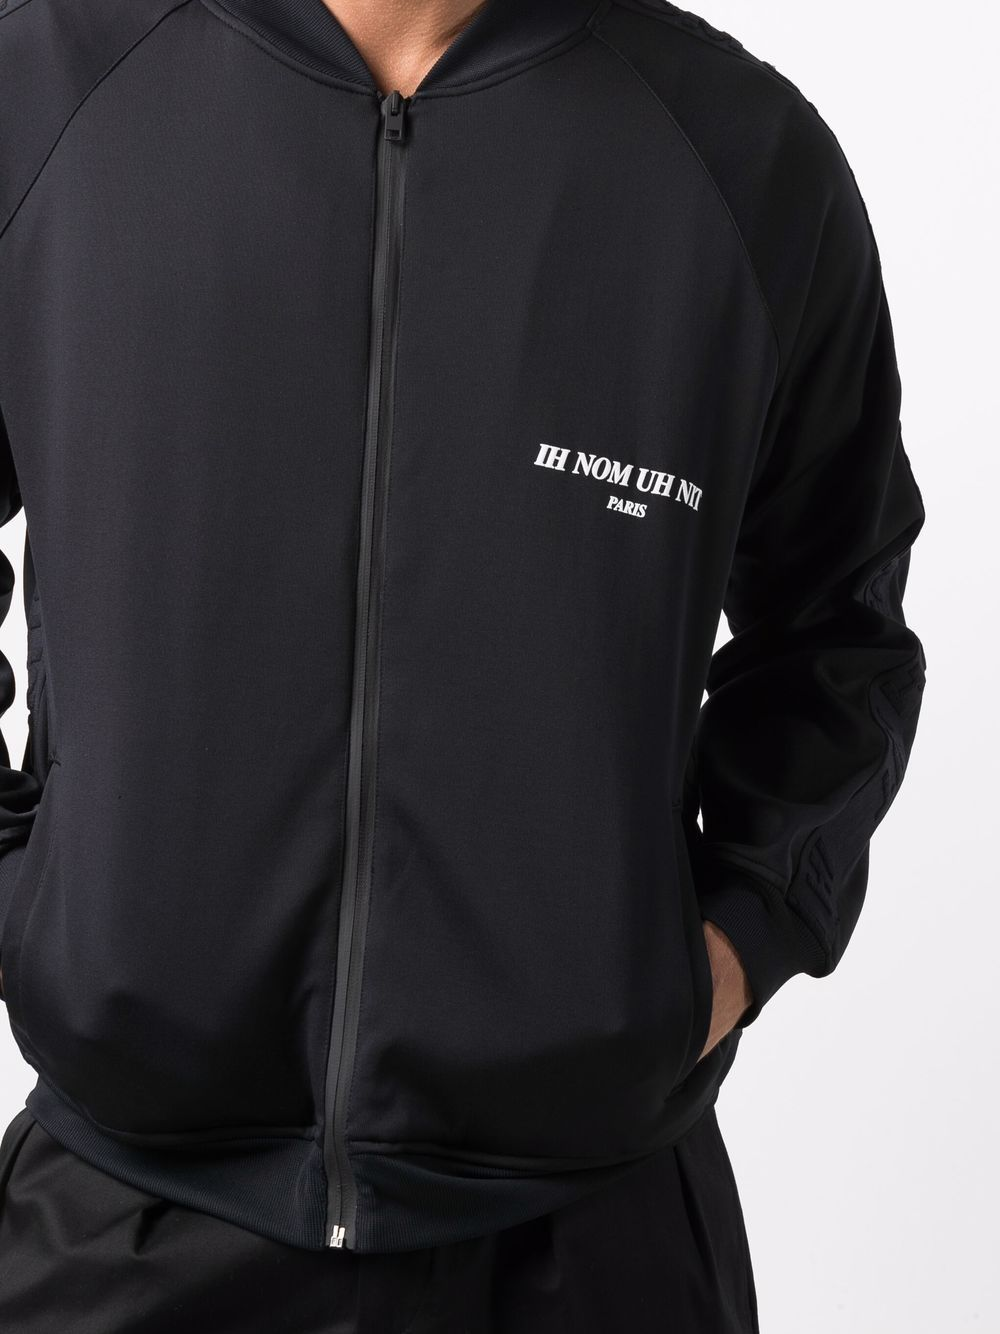 Picture of Ih Nom Uh Nit | Logo Tape Jacket